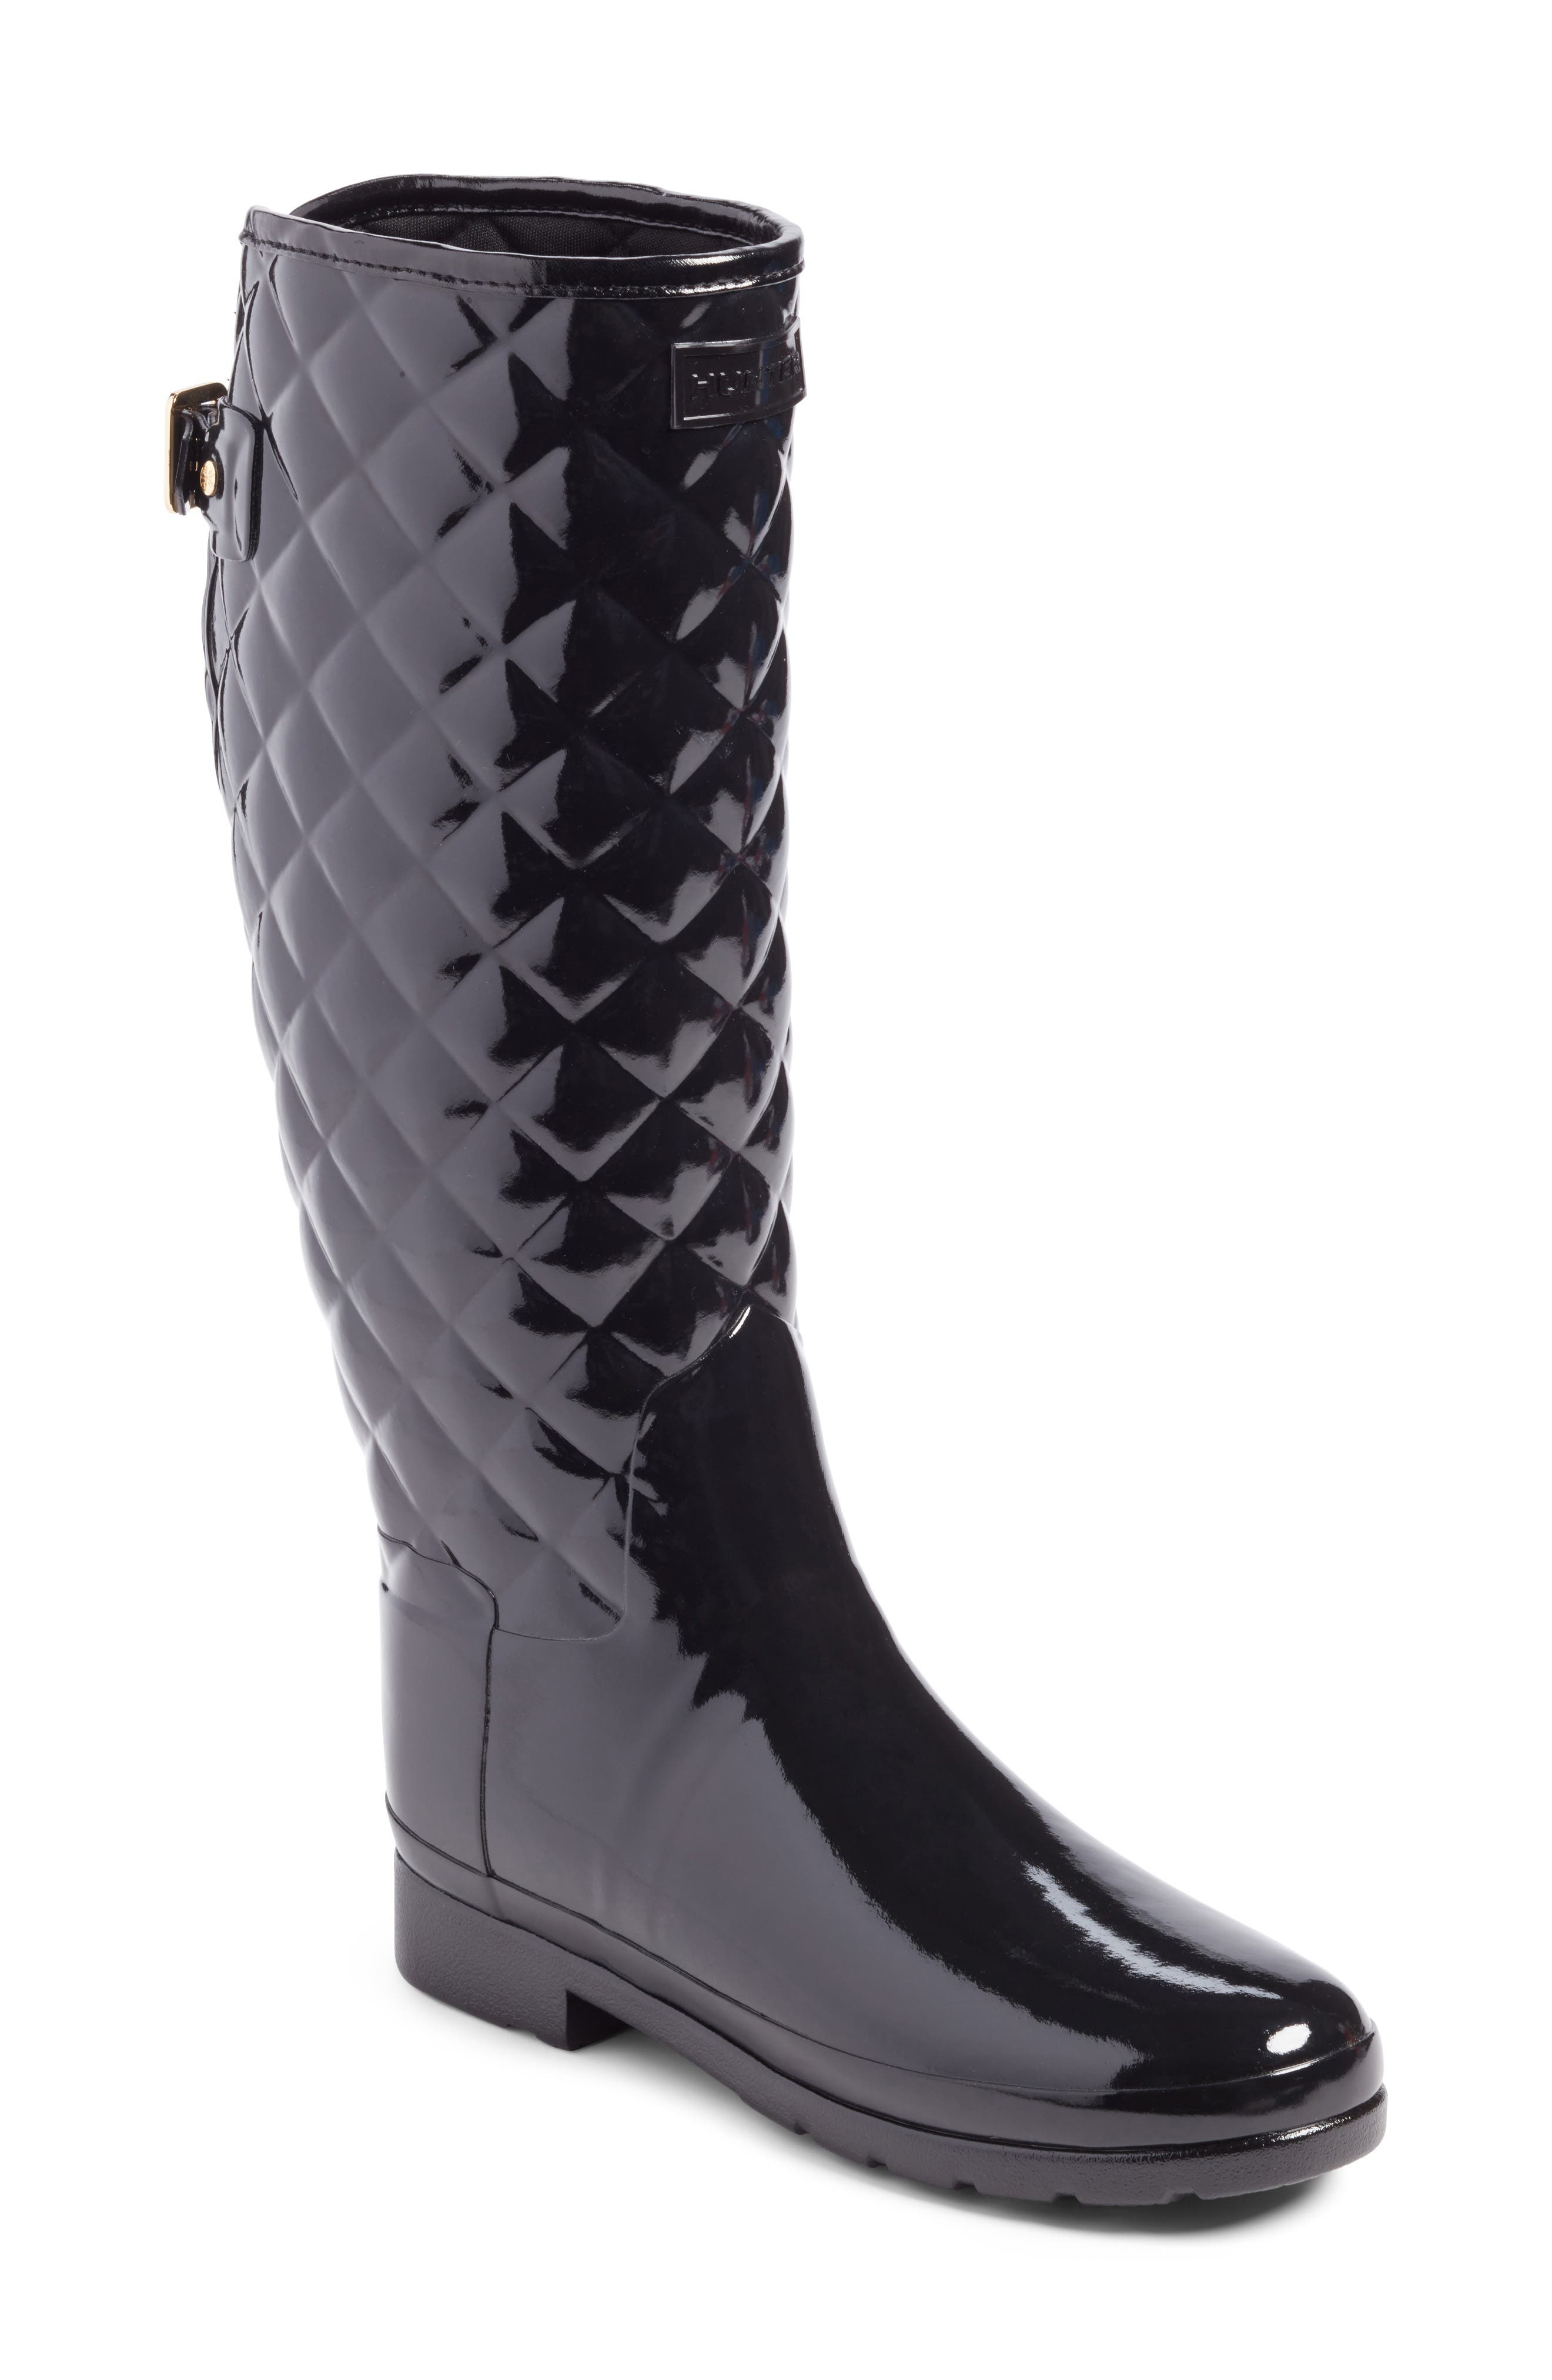 Hunter Original Refined High Gloss Quilted Waterproof Rain Boot, Black